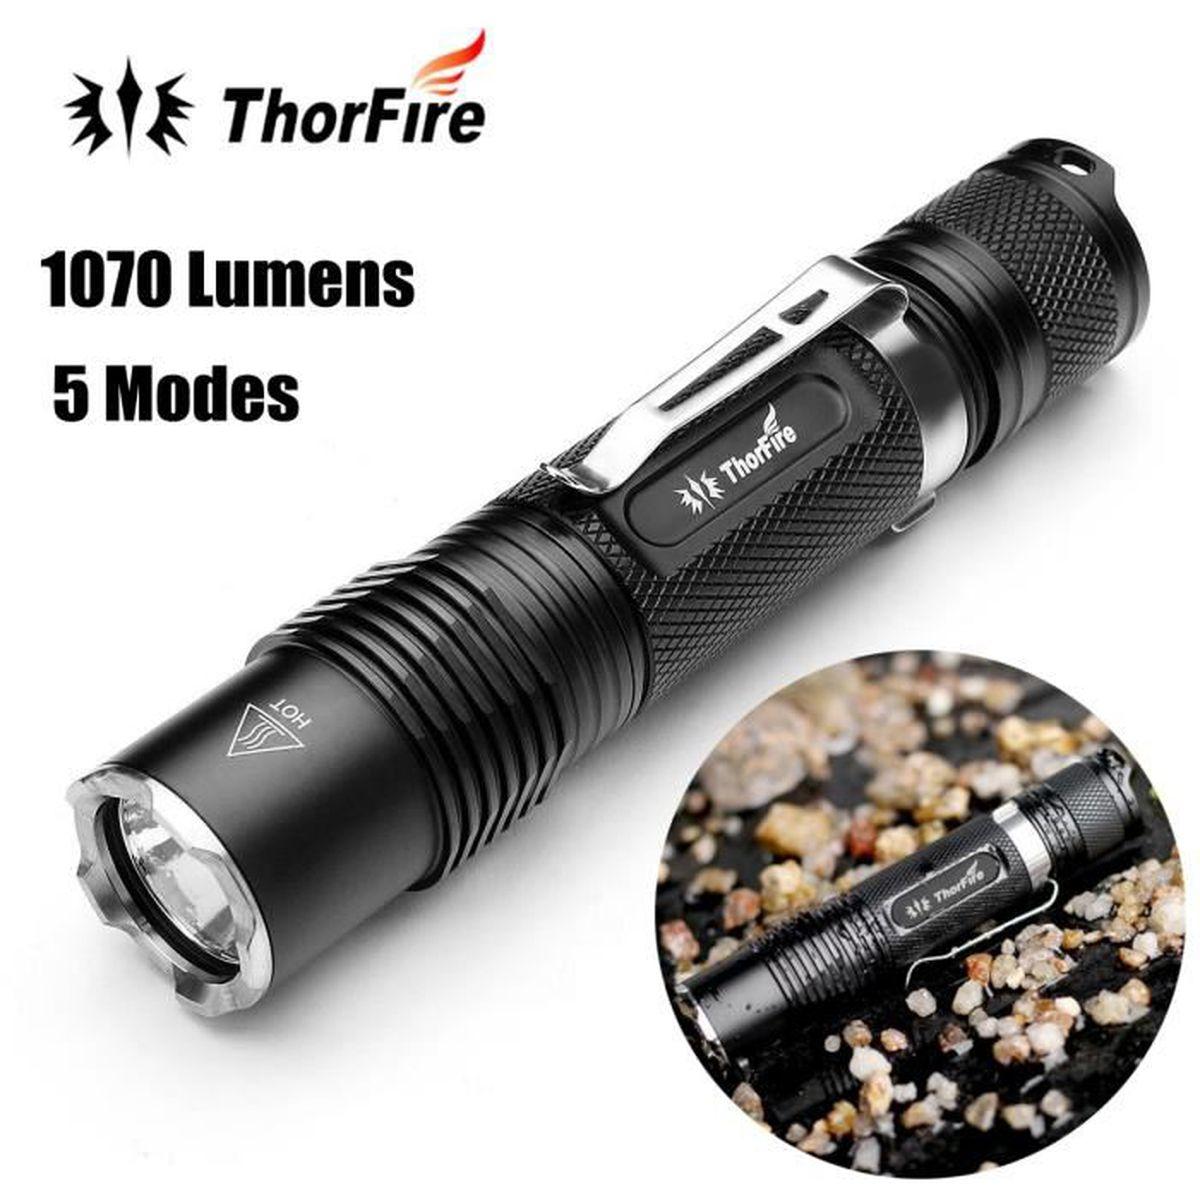 Lampe de poche Penlight avec DEL Mini lampe de poche design Stylet